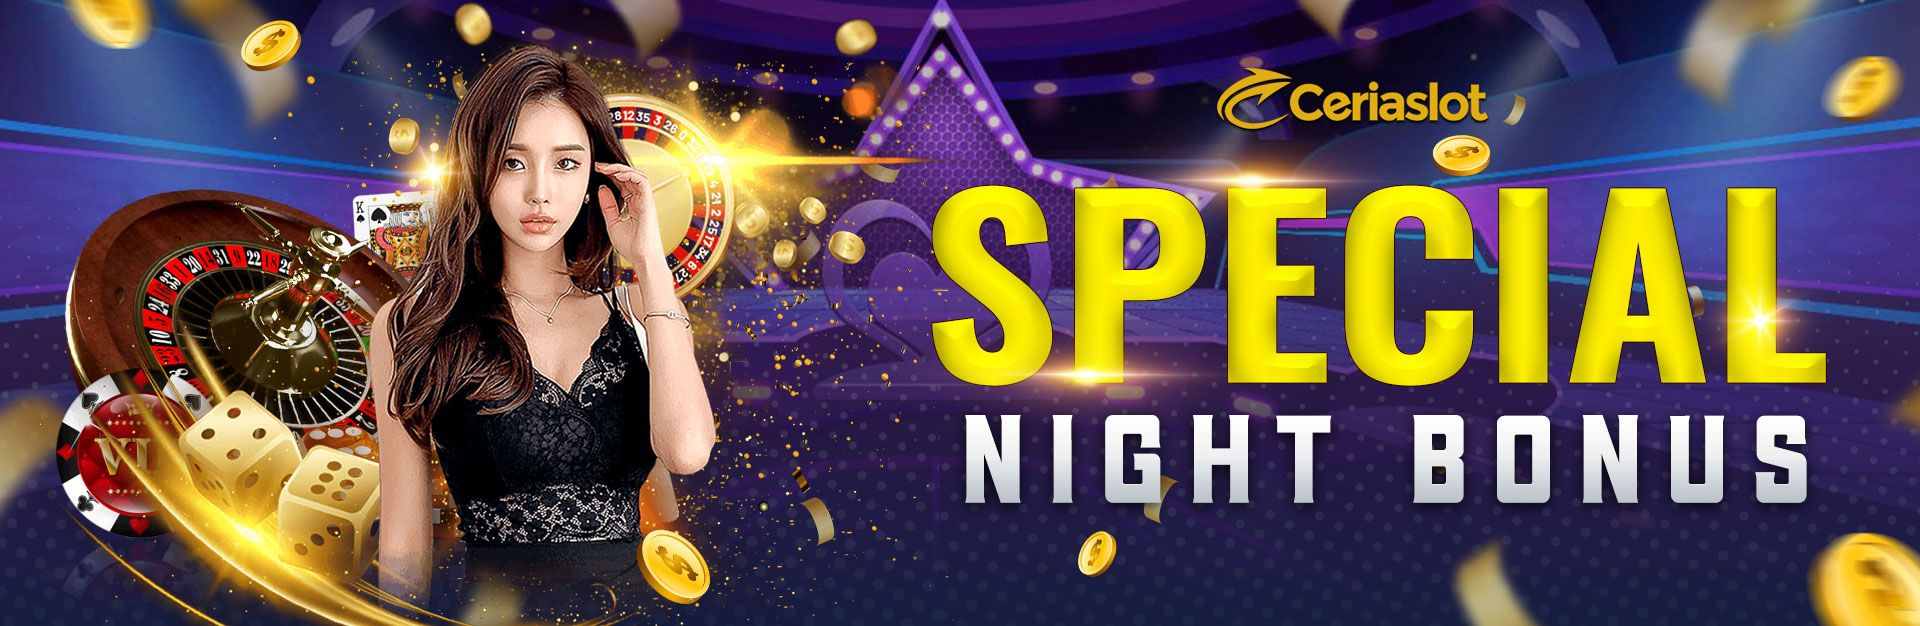 Special Night Bonus - CERIASLOT